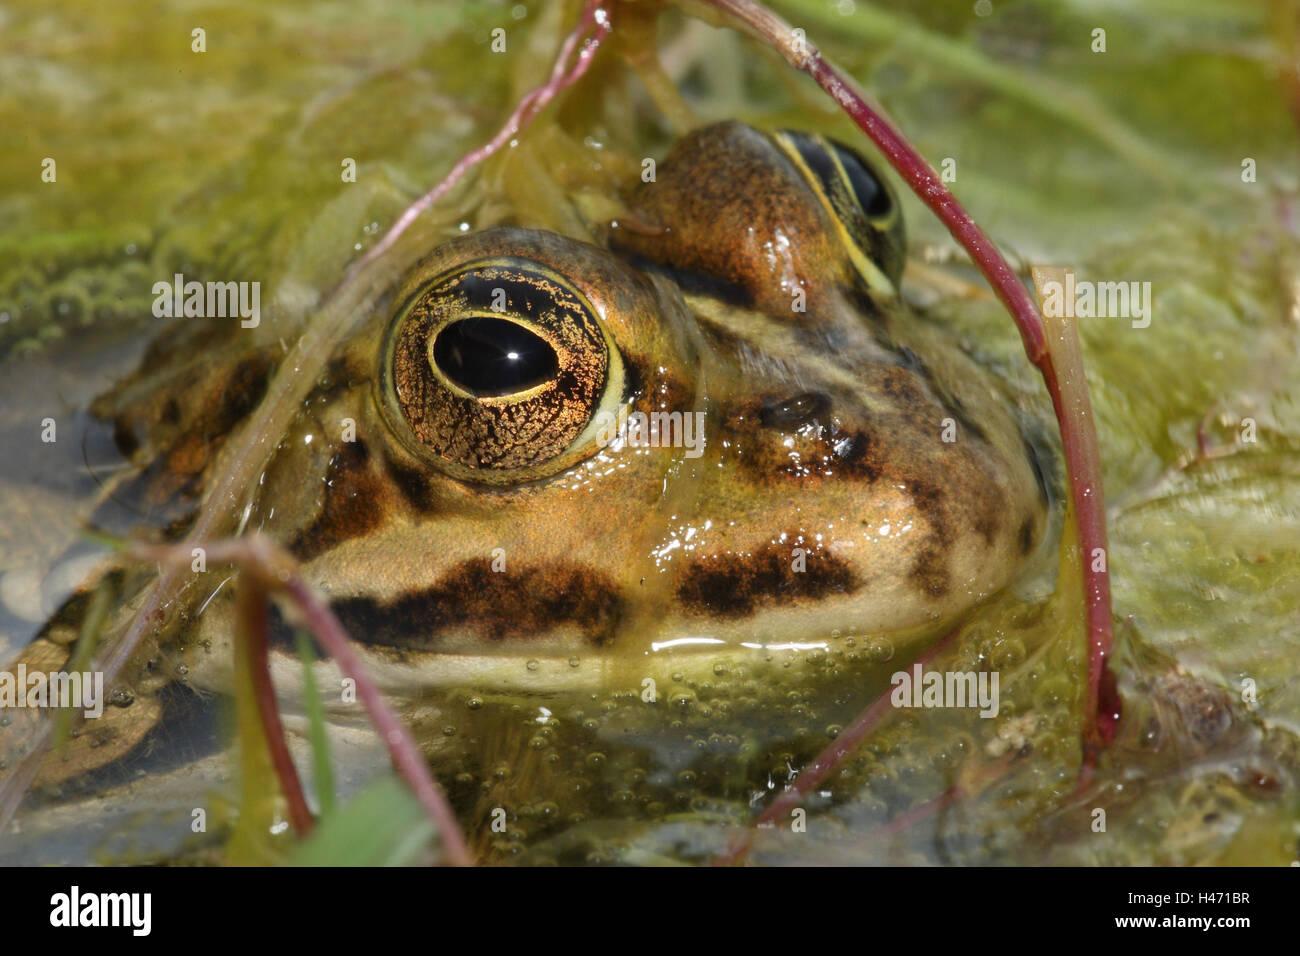 Water frog, Rana esculenta, - Stock Image